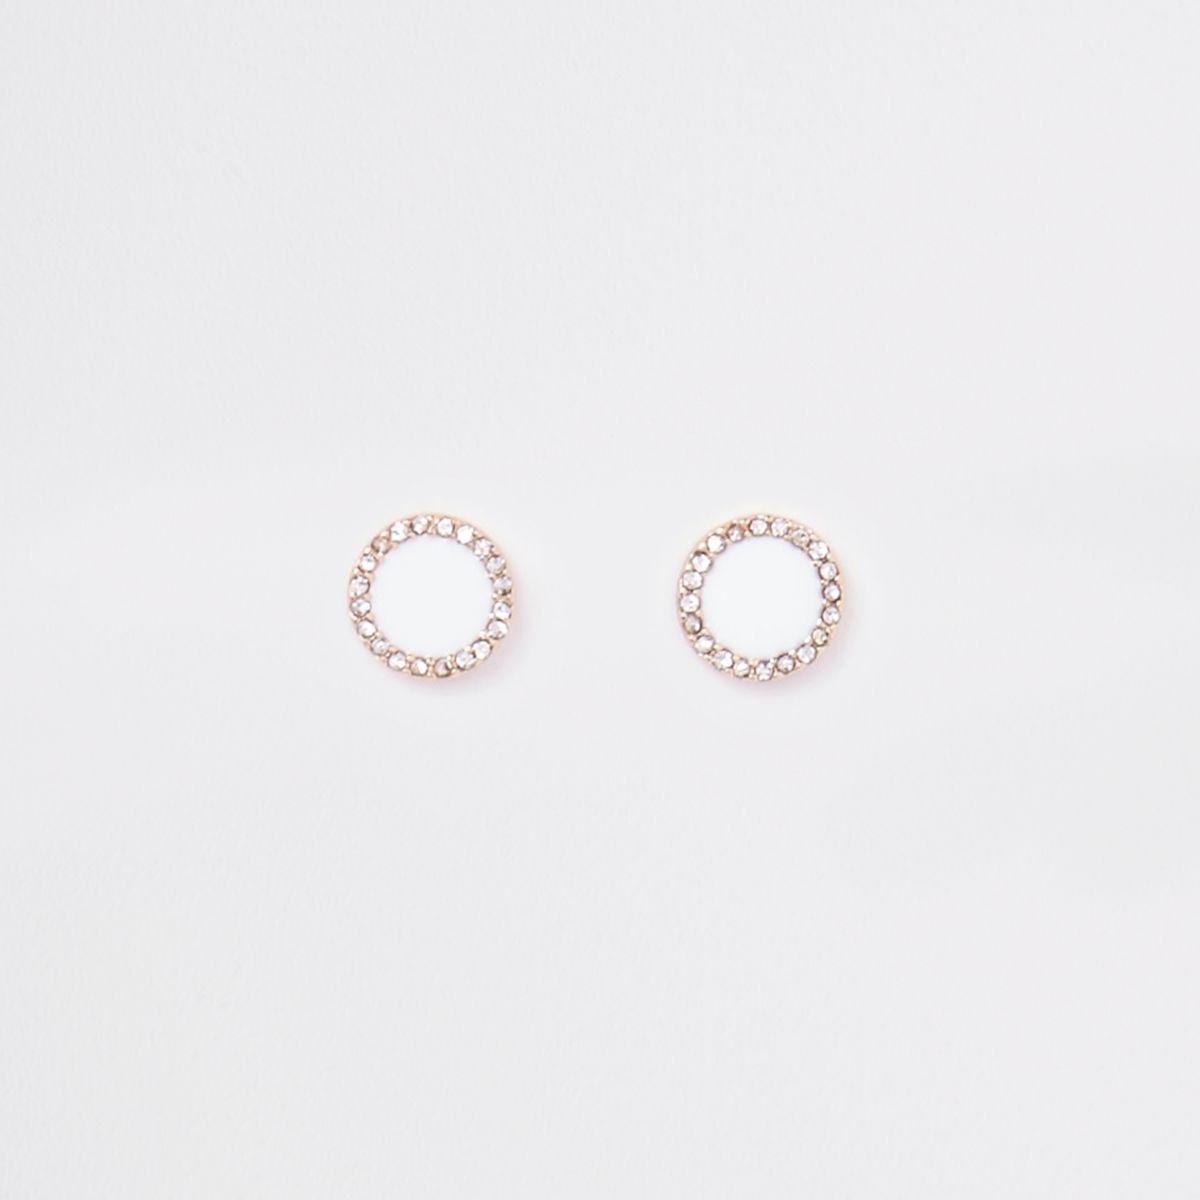 White gold tone enamel circle stud earrings